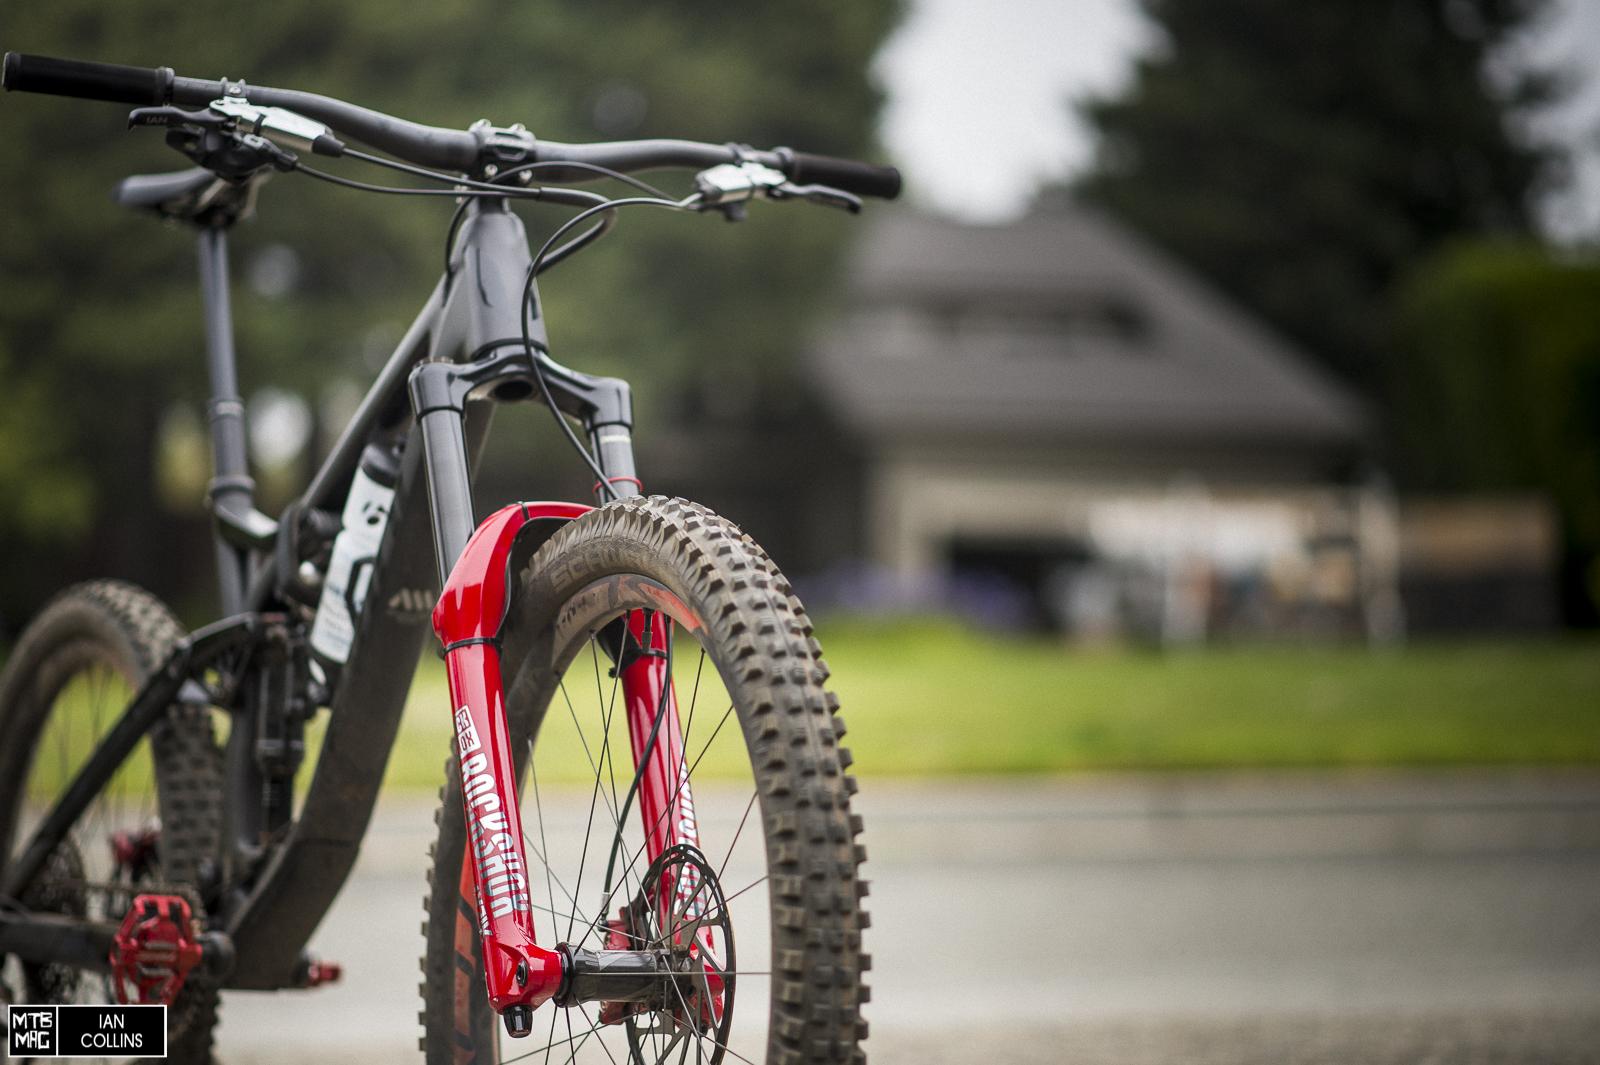 MTB-MAG COM - Mountain Bike Magazine   [Tested] 2019 RockShox Lyrik RC2